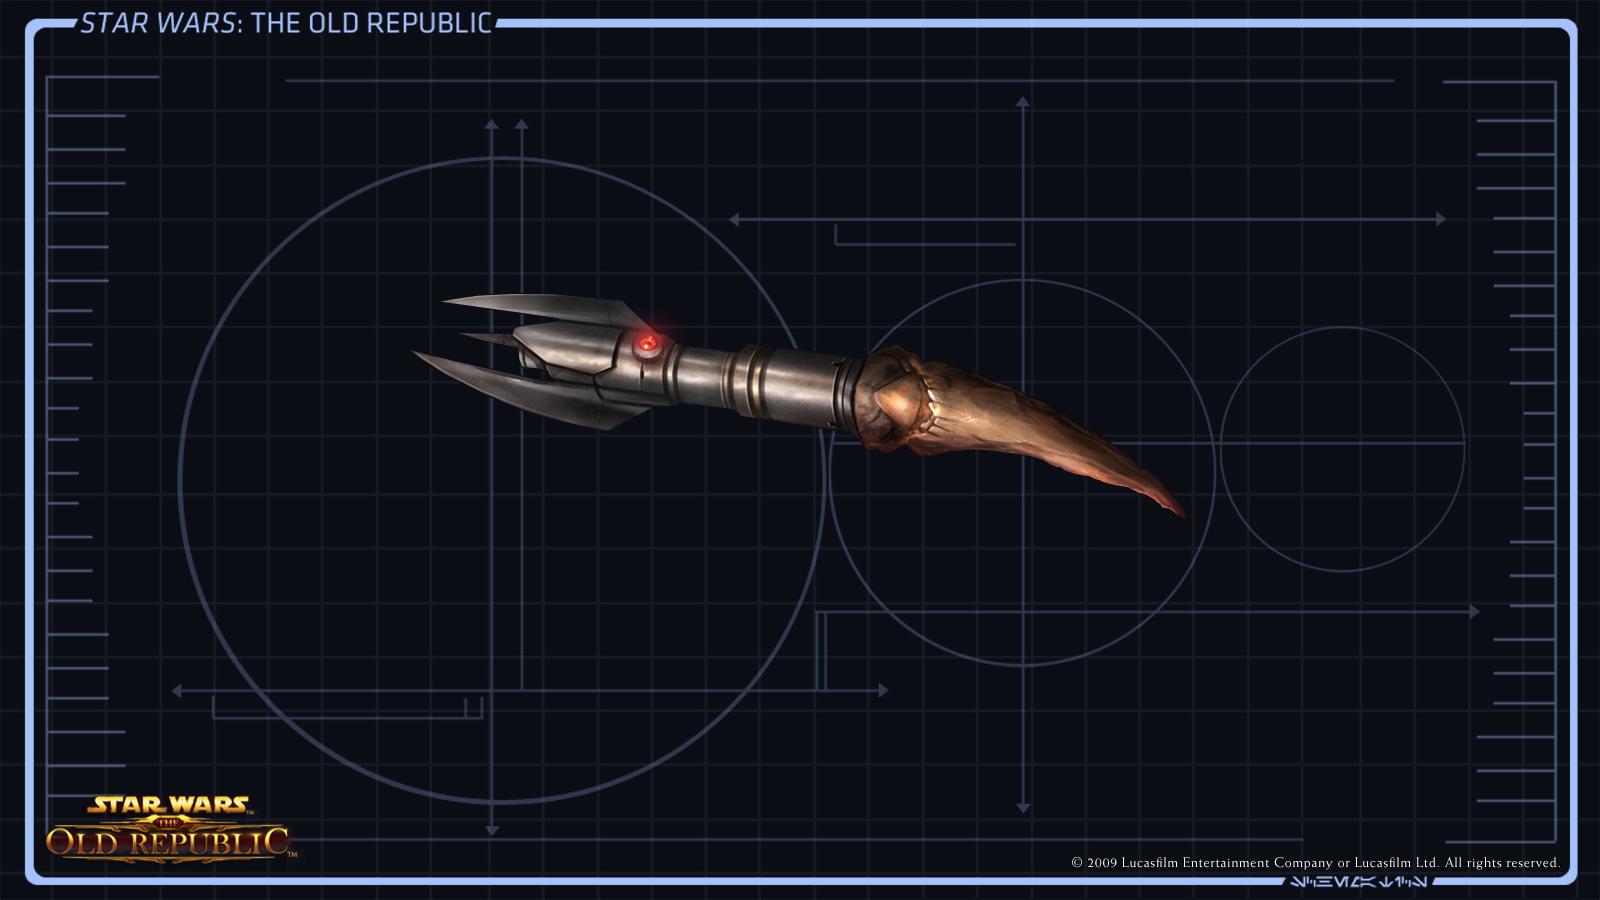 Lightsaber Star Wars The Old Republic Wiki Fandom Powered By Wikia